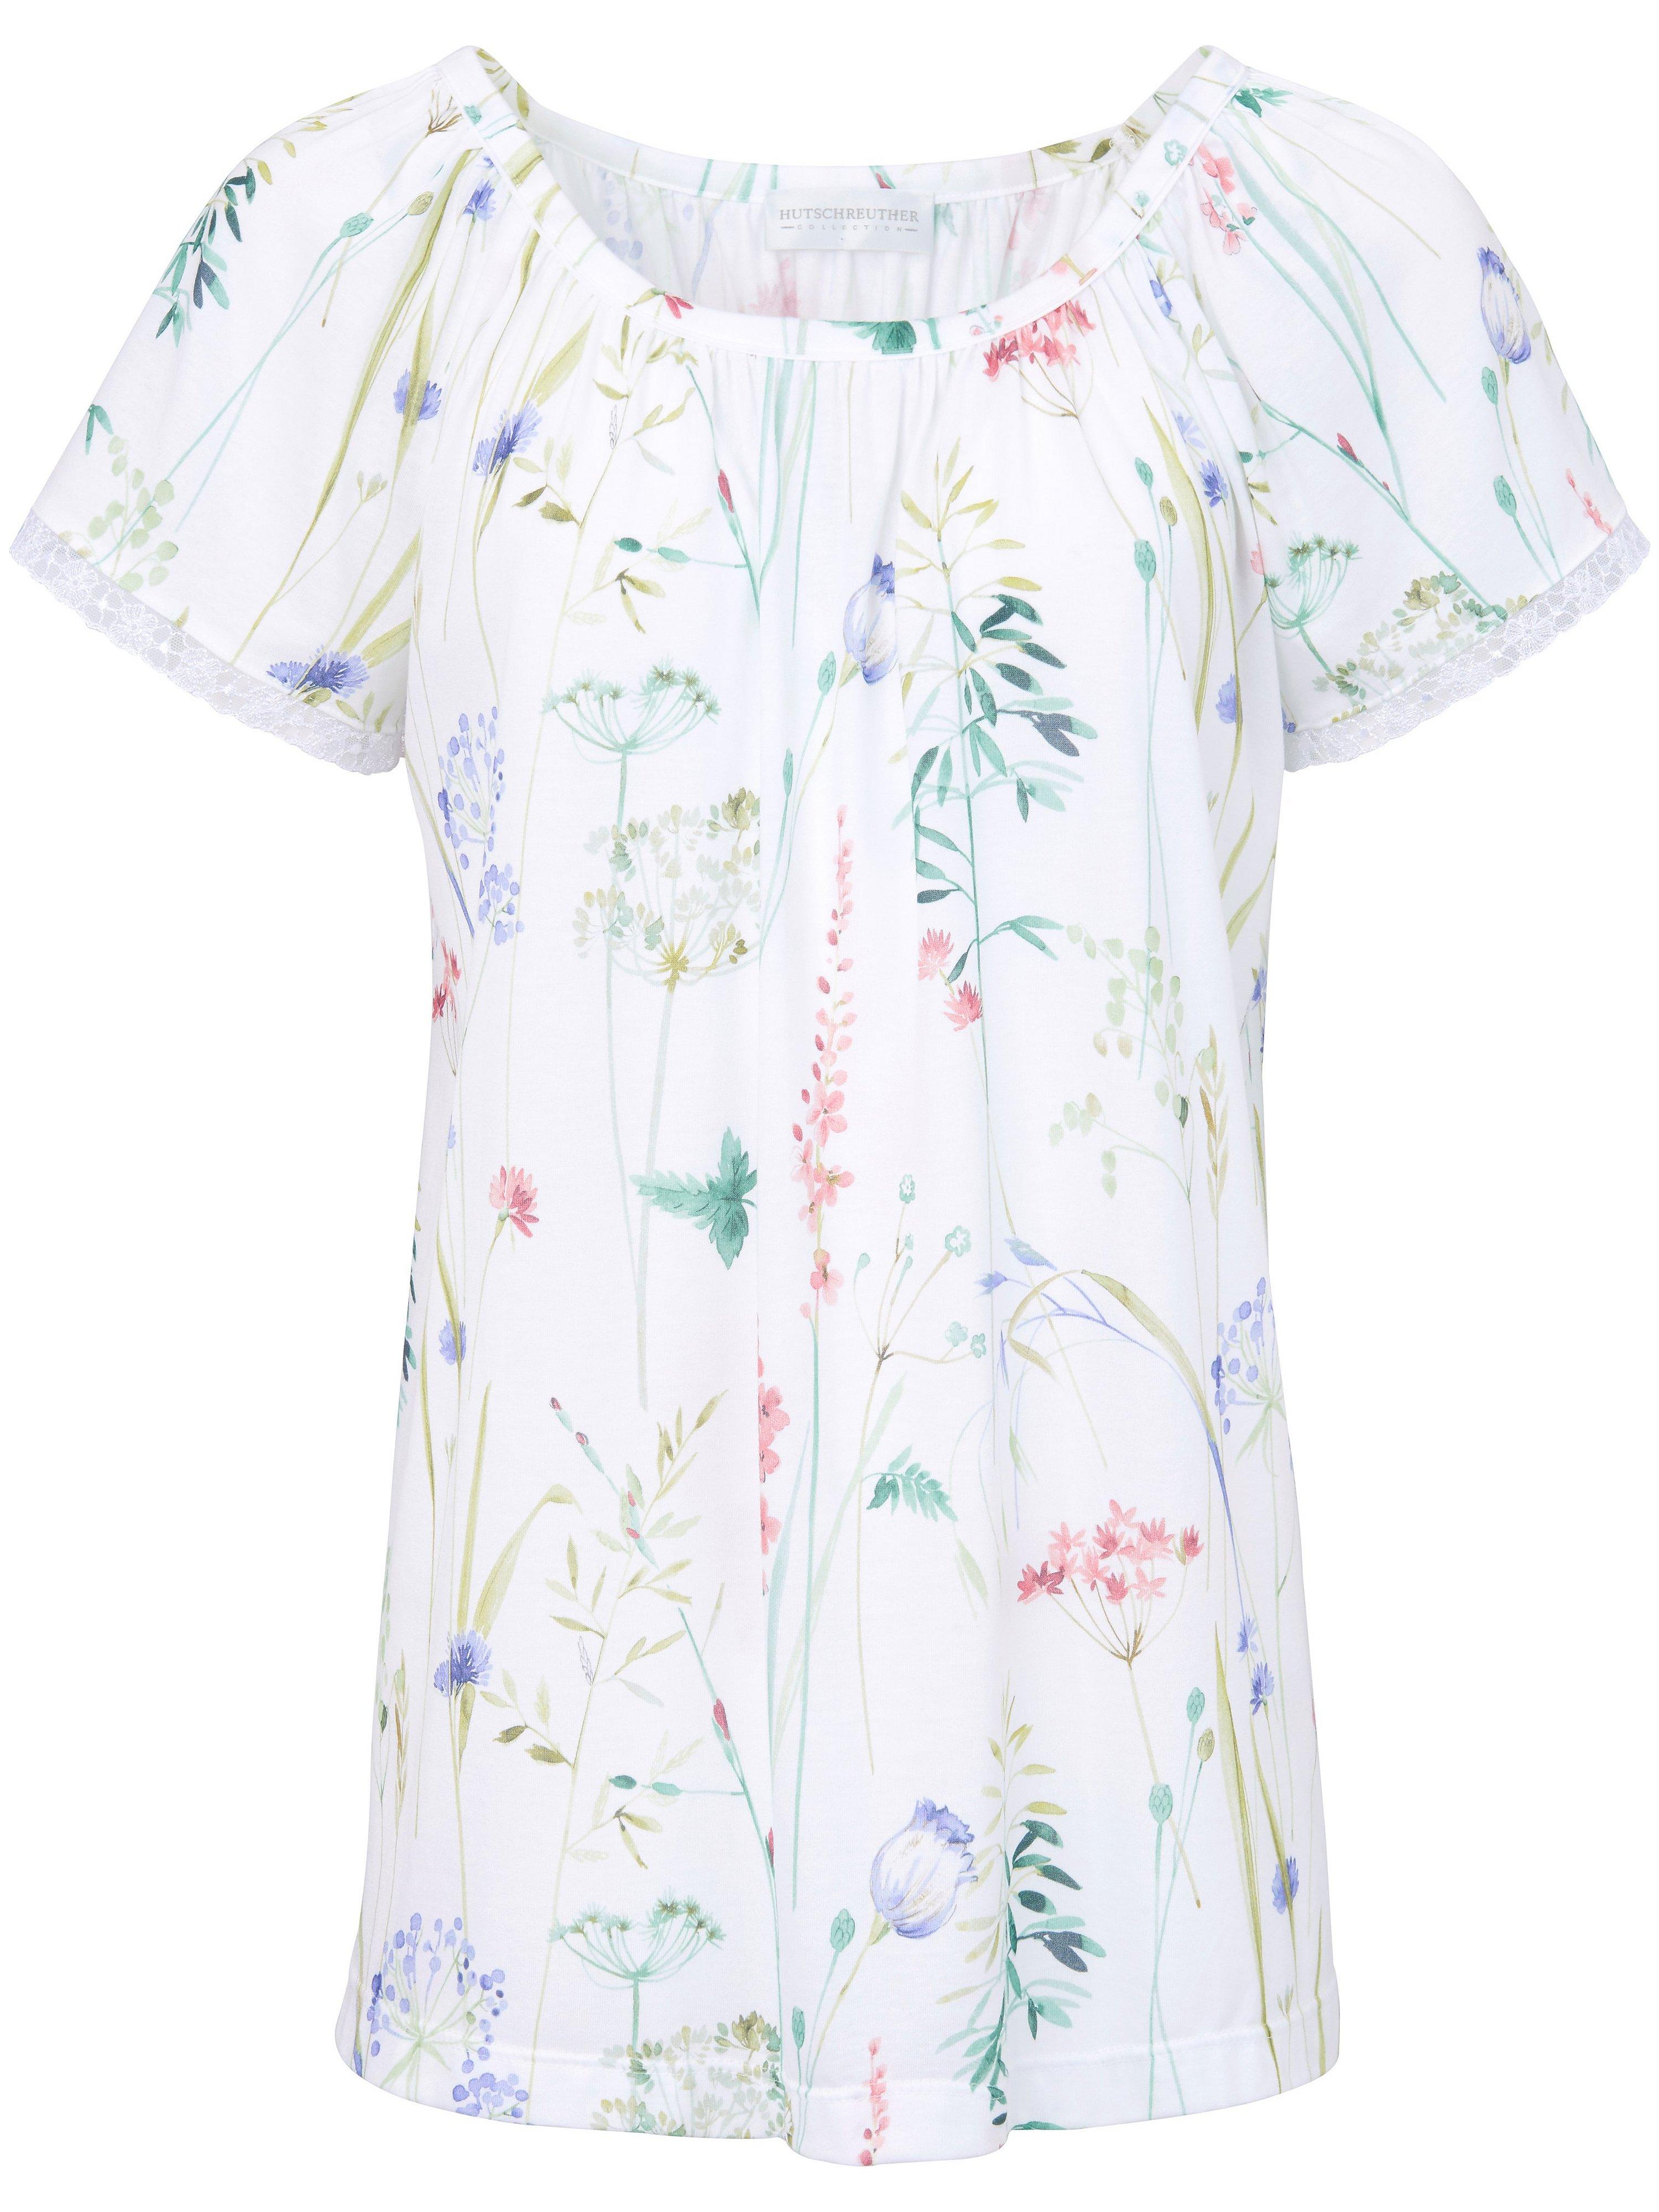 Le pyjama single jersey  Hutschreuther multicolore taille 42